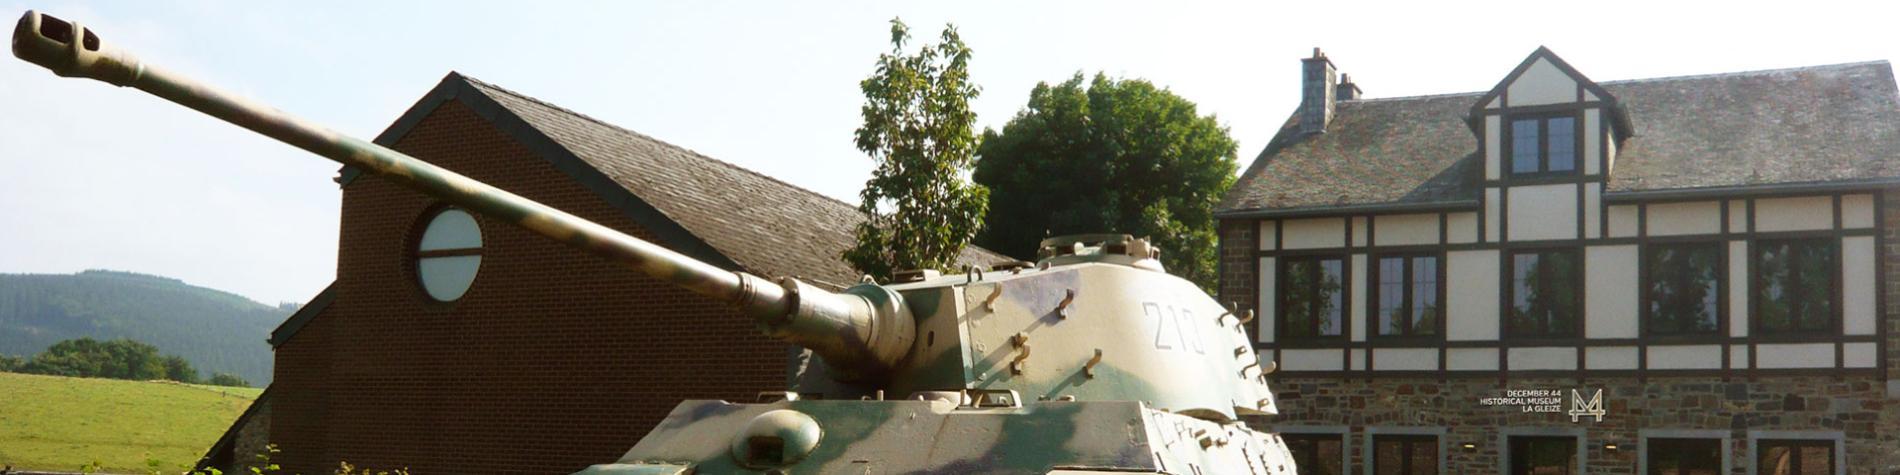 Char - Tigre Royal - Musée Decembre 44 - Wallonie insolite